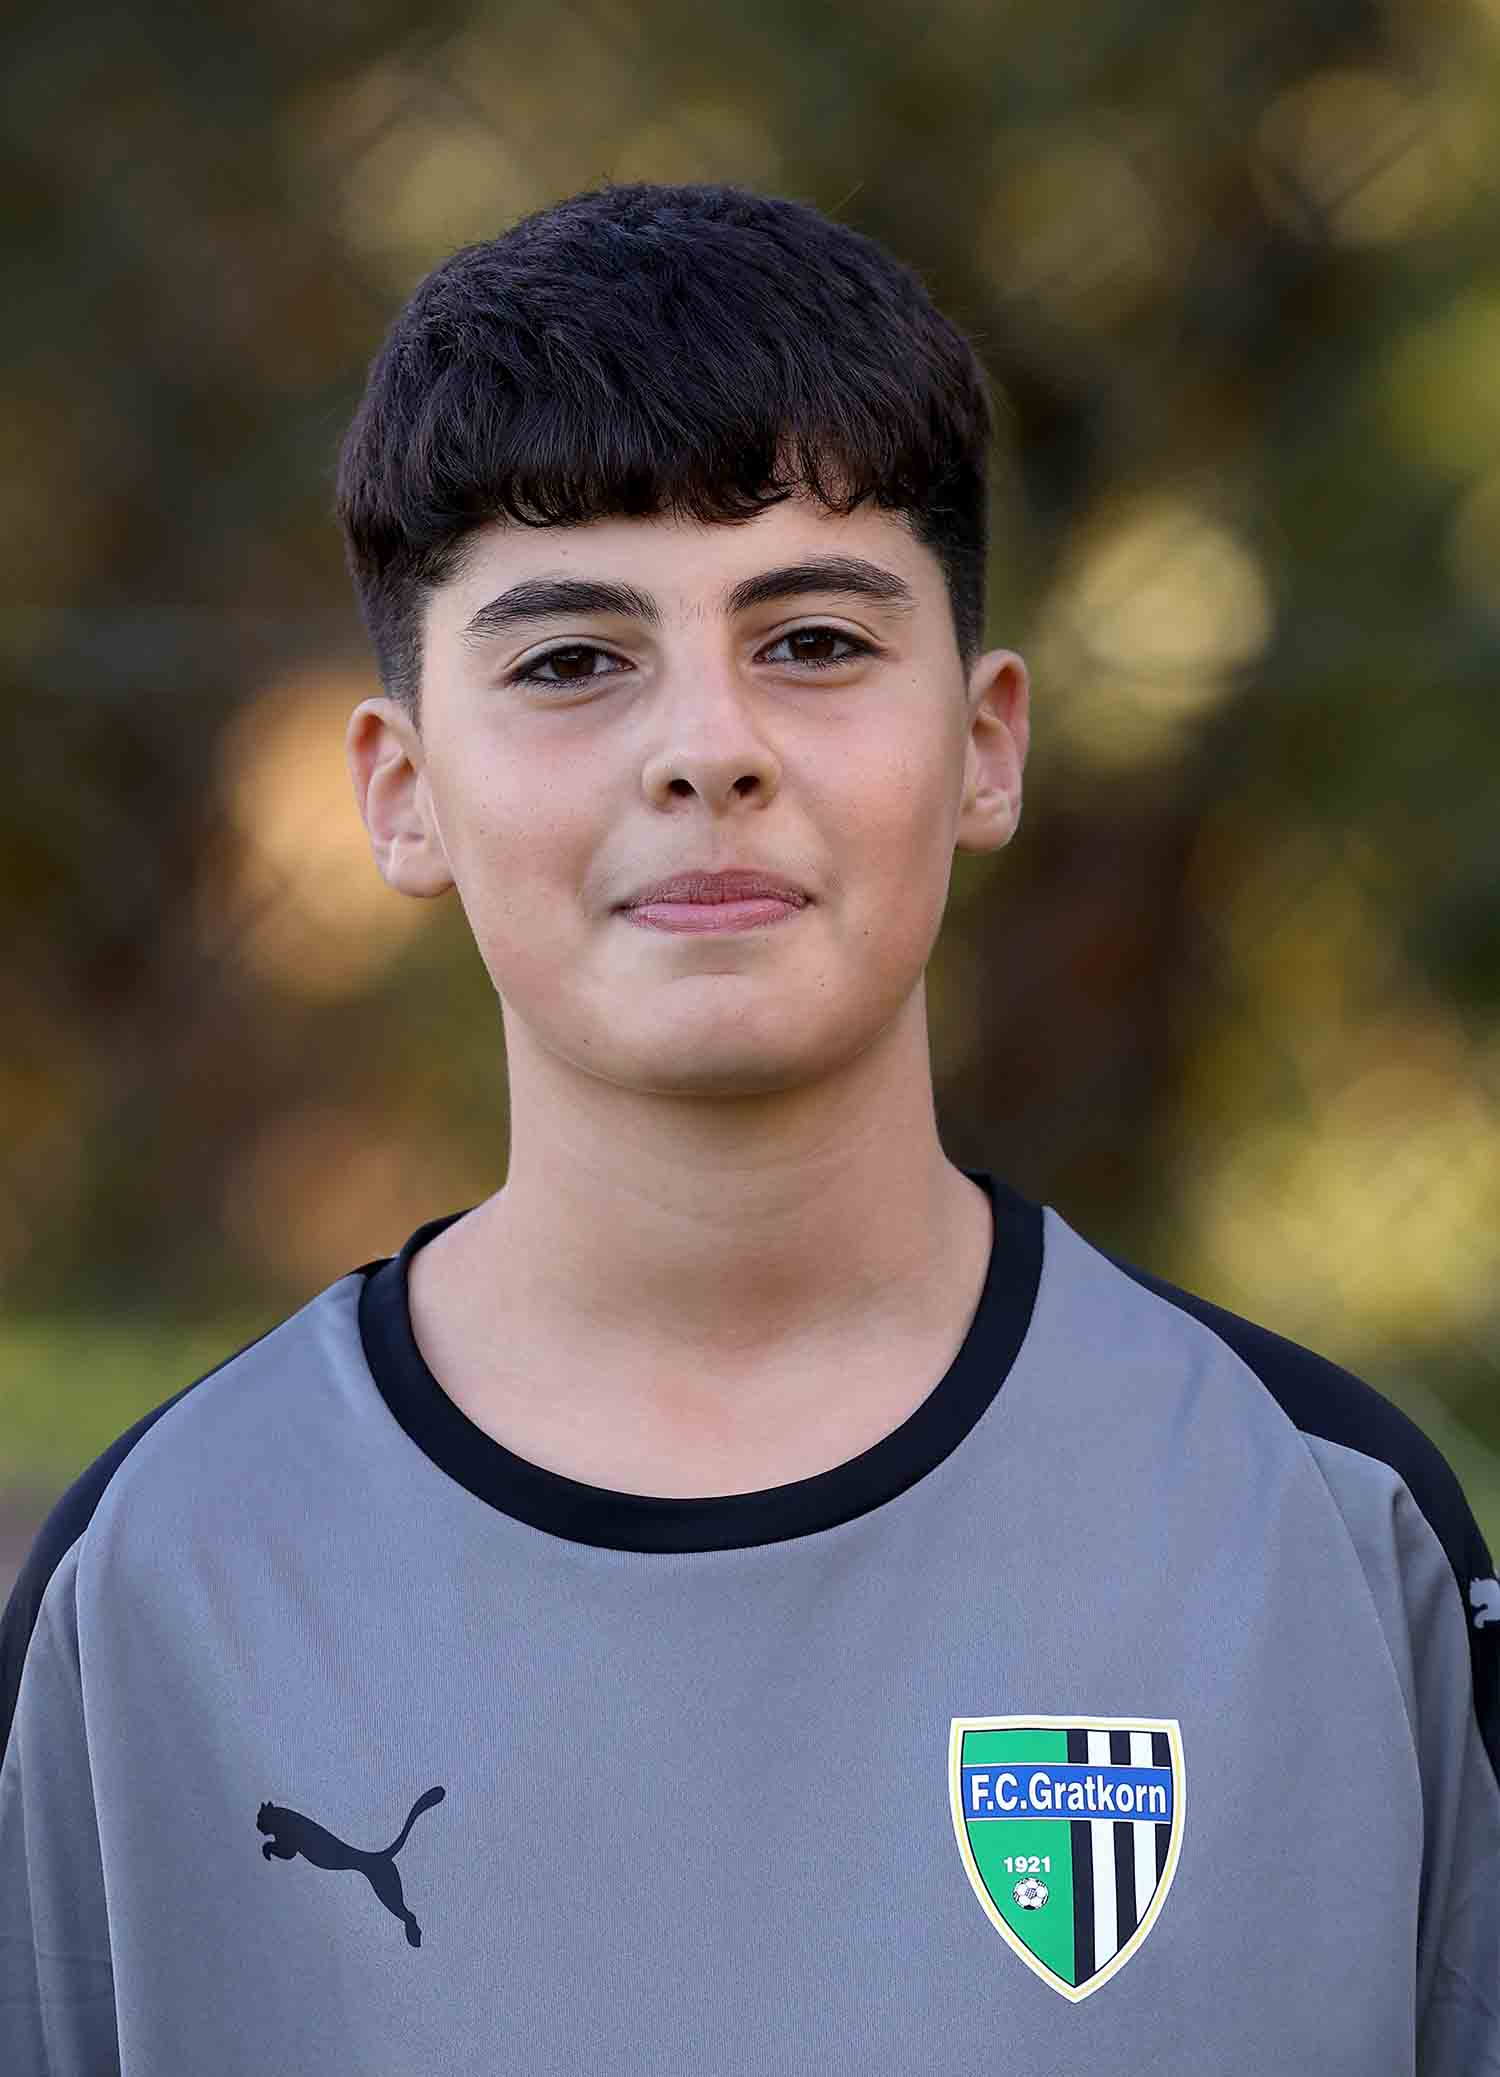 Arda Akdag, FC Gratkorn U13